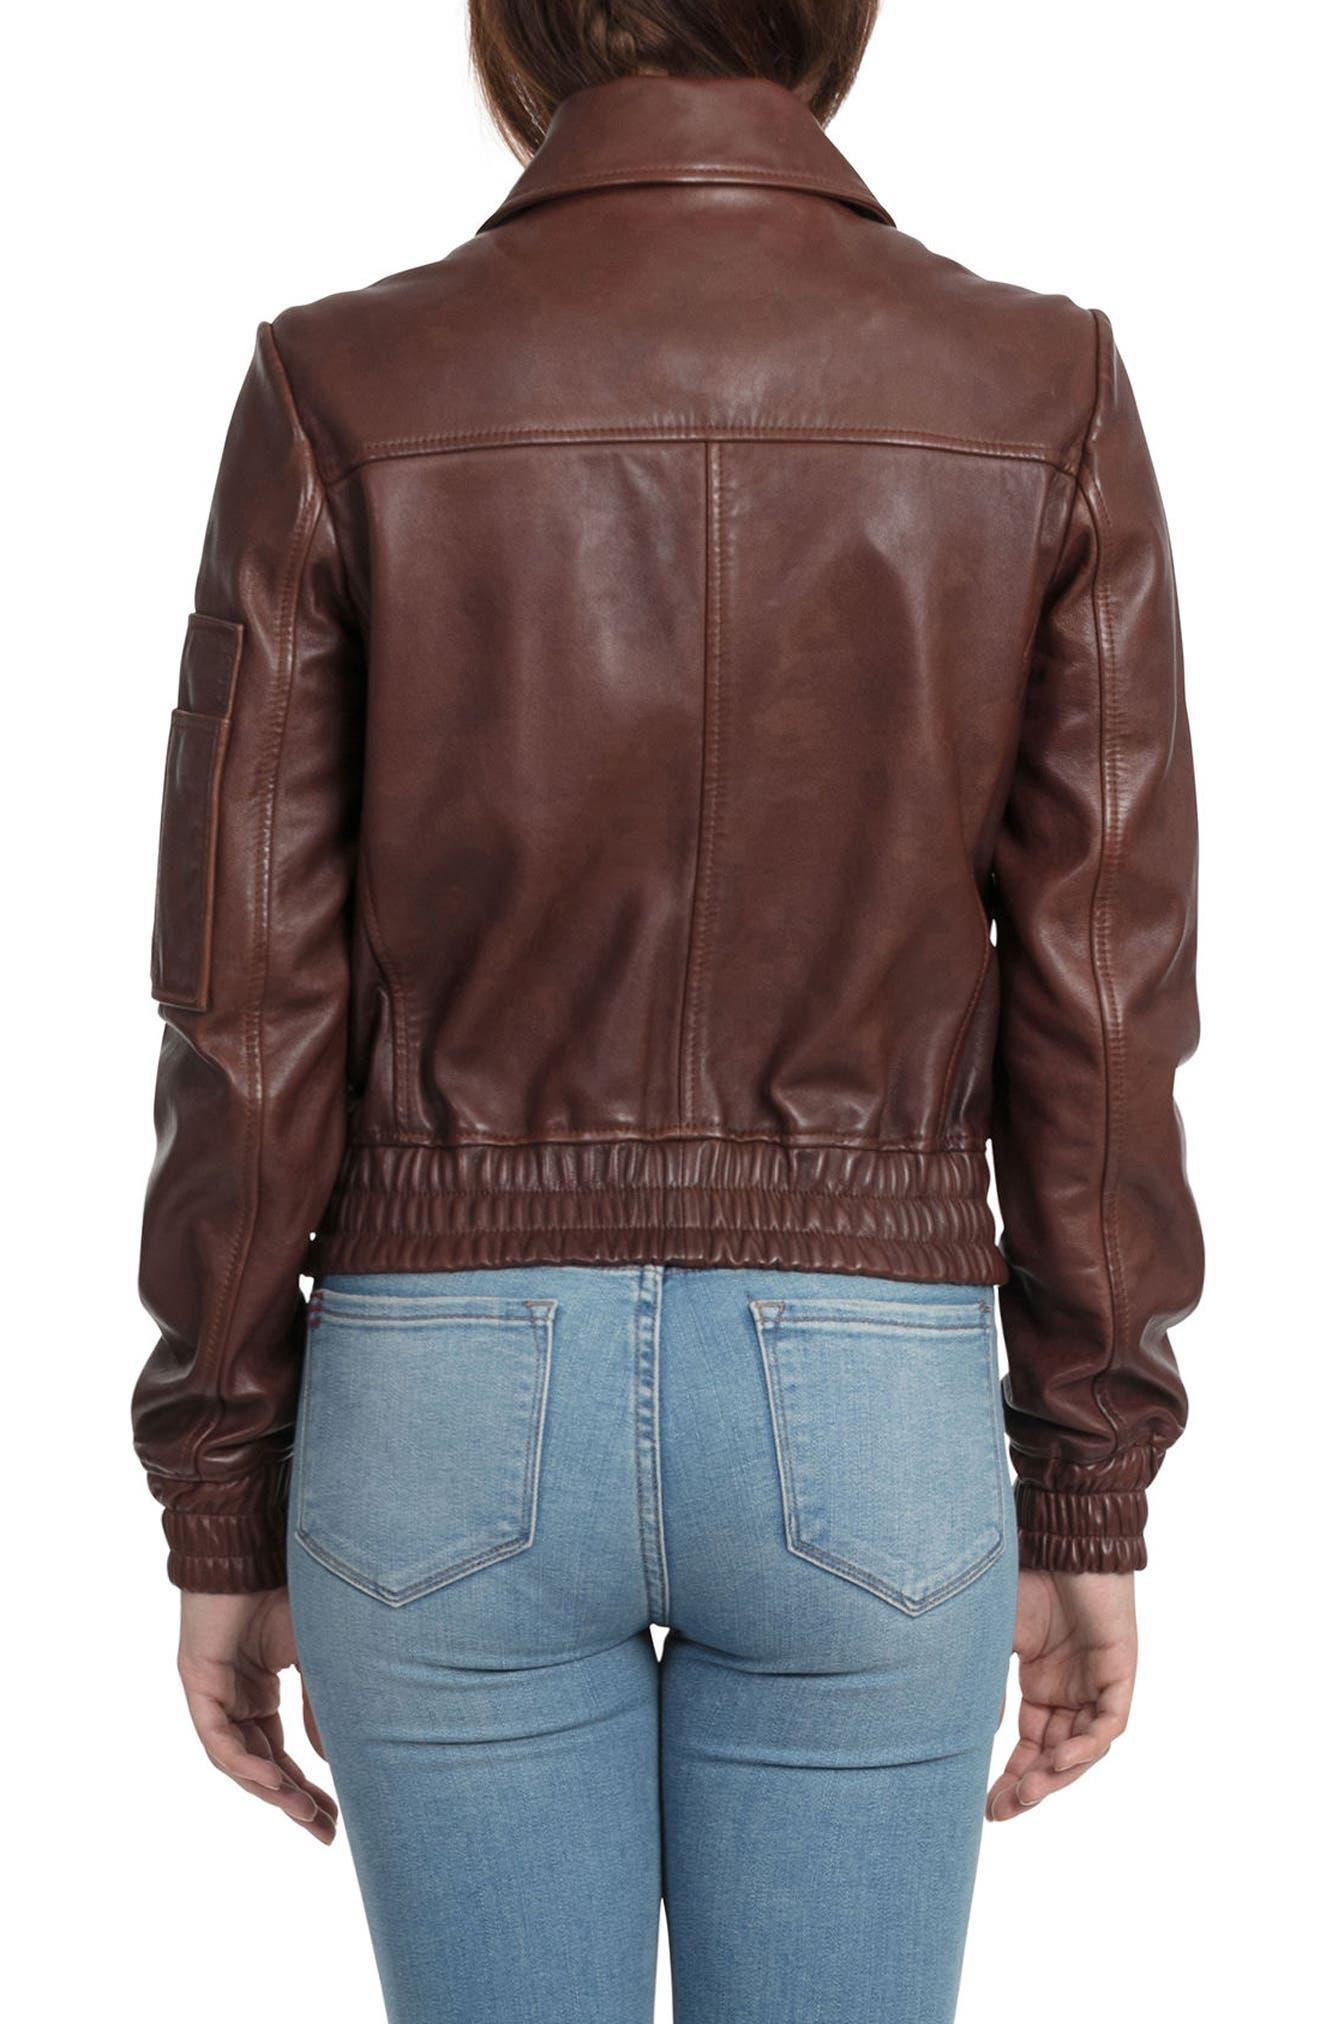 BAGATELLE.CITY The Aviator Leather Jacket,                             Alternate thumbnail 2, color,                             Mahogany